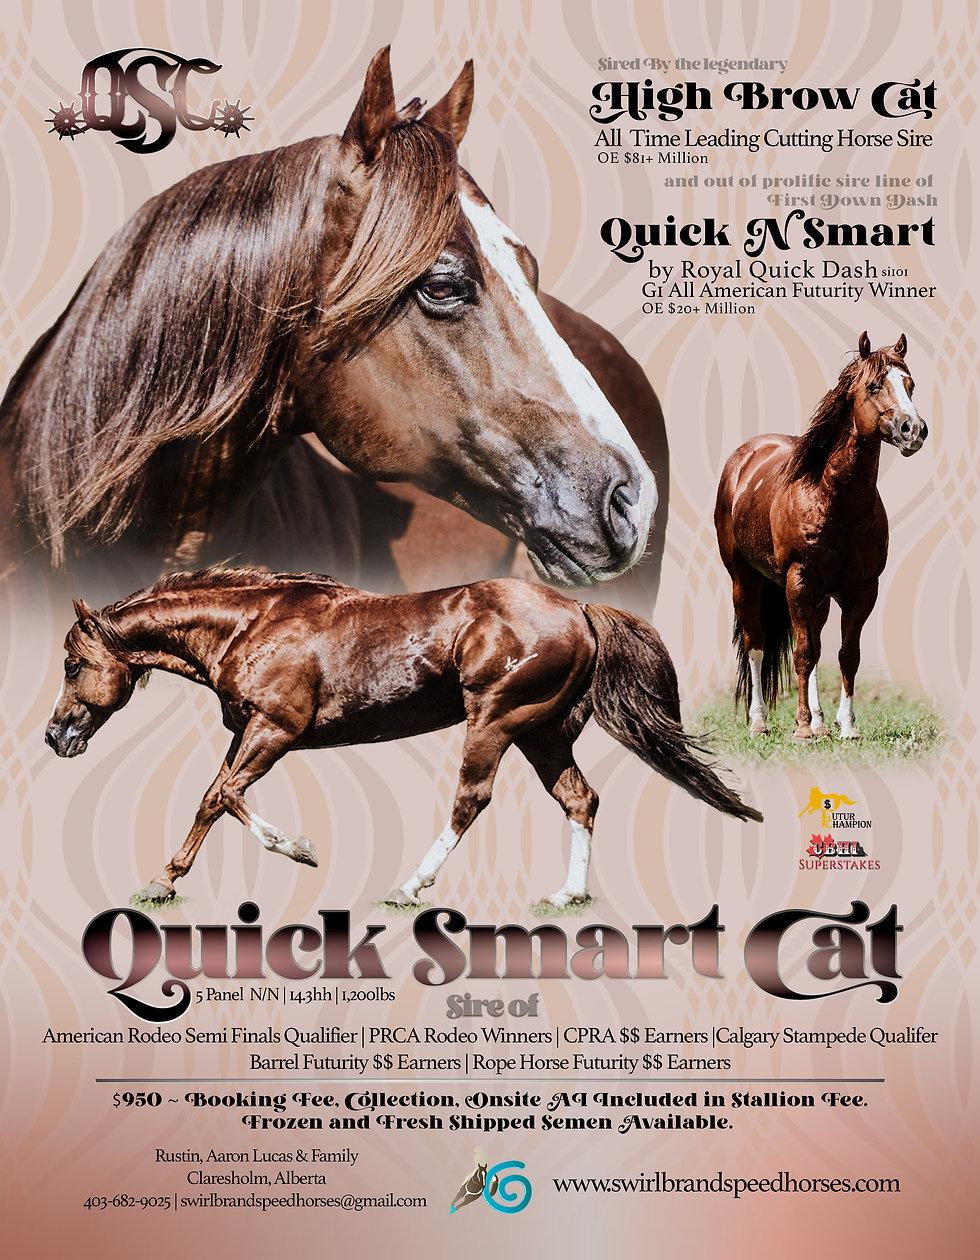 Quick Smart Cat.jpg